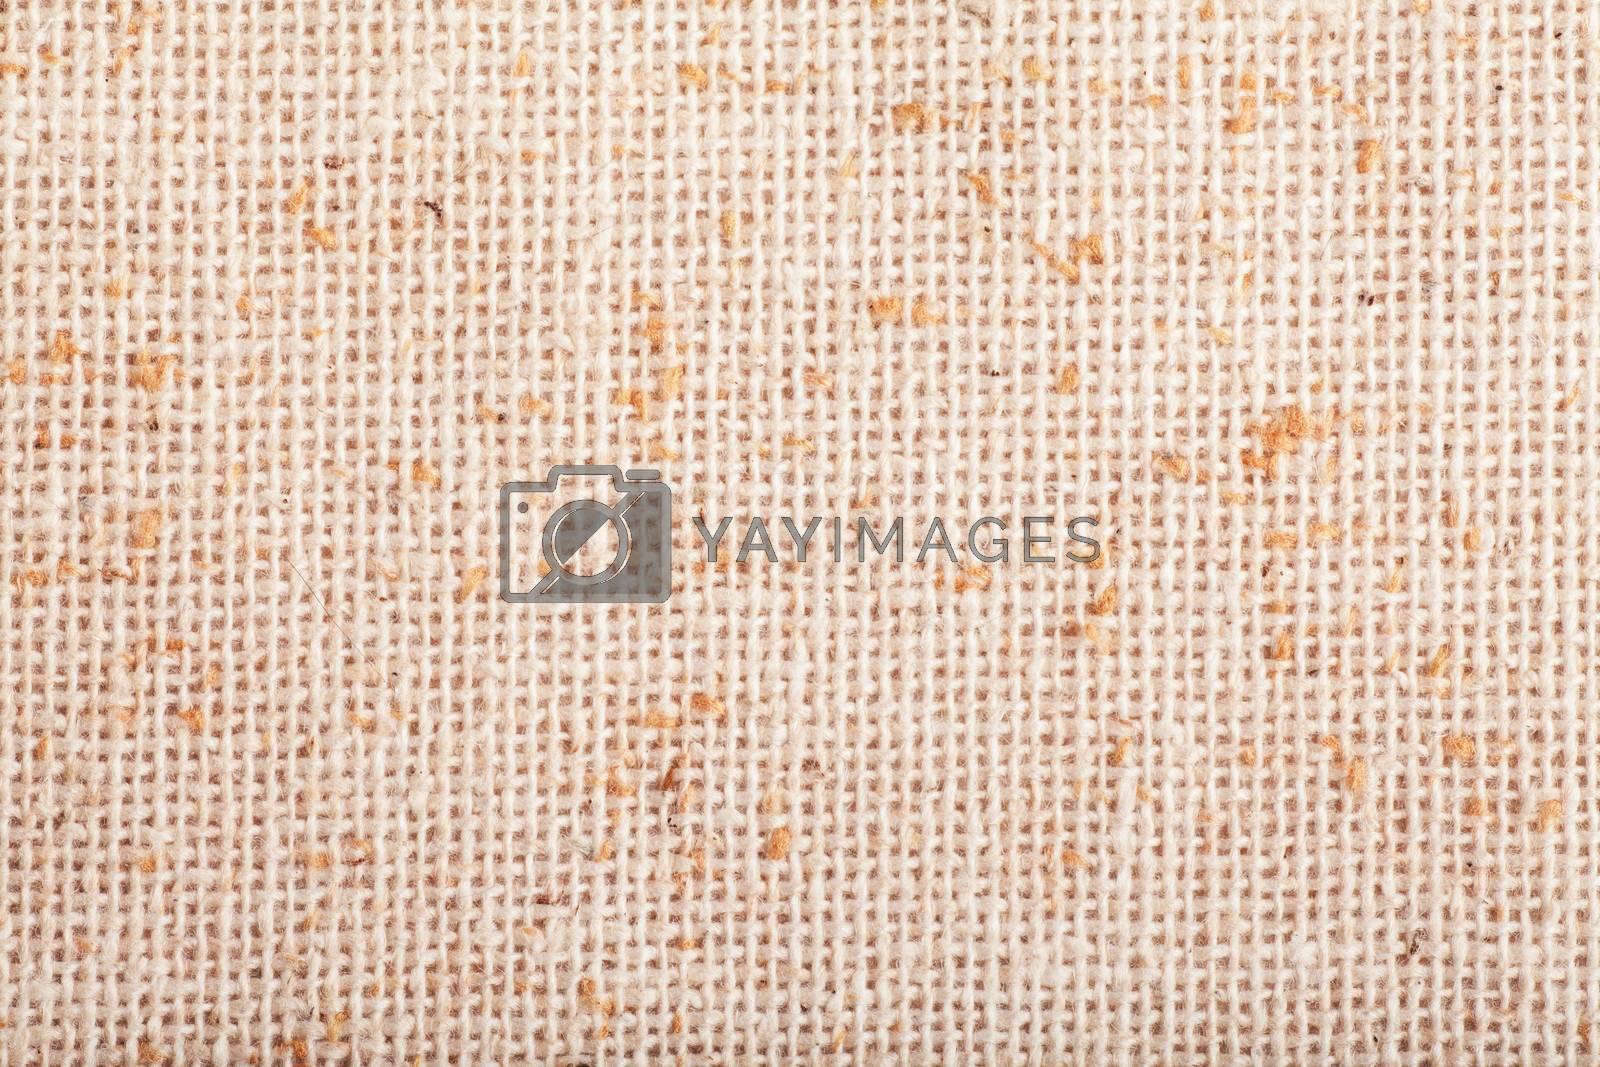 Macro view of sack texture